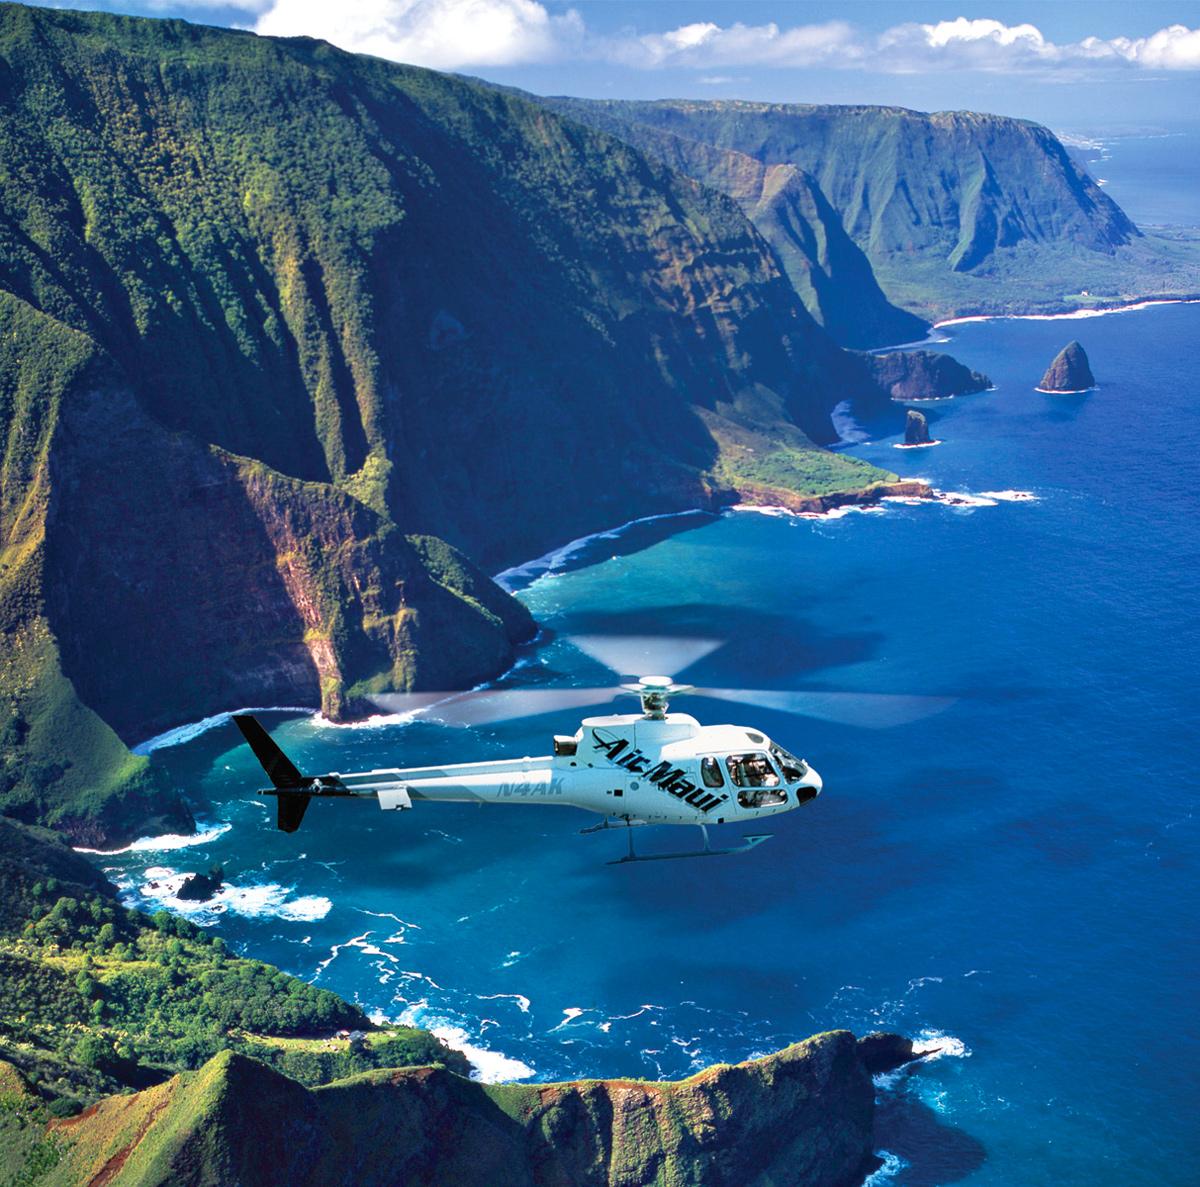 Air Maui  West Maui Amp Molokai Helicopter Tour 60 Min  Hawaii Discount